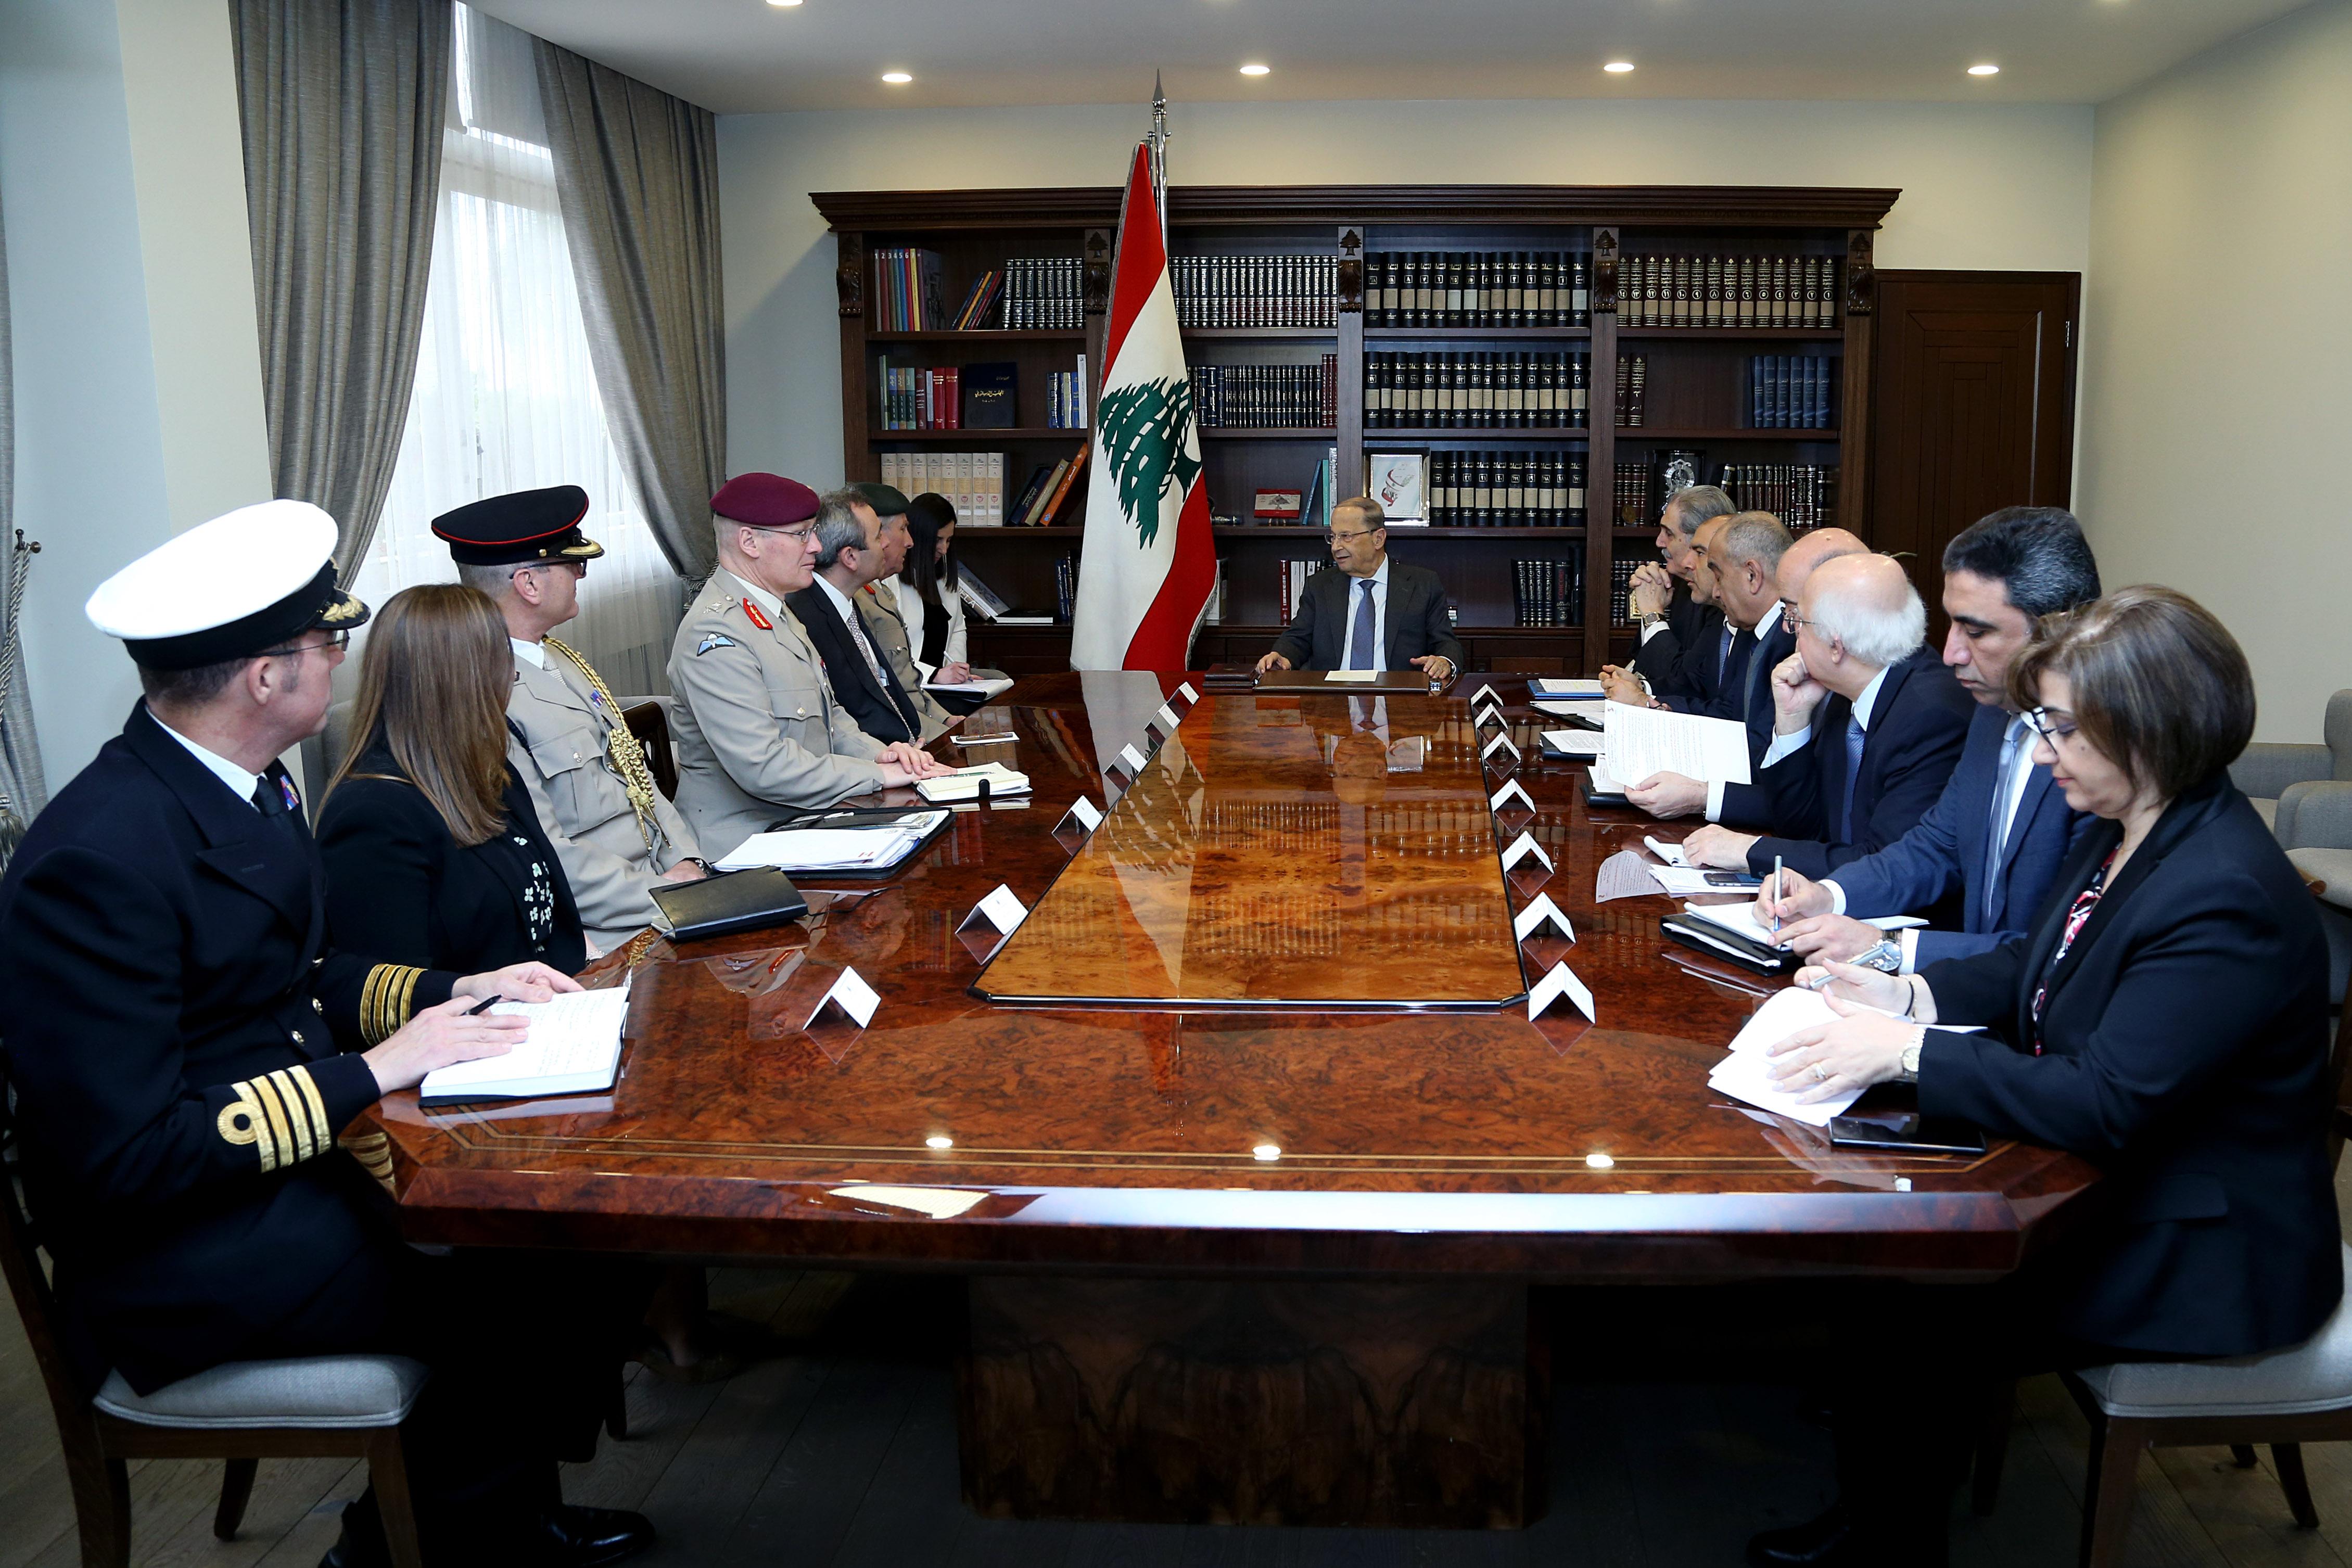 01 - Gen. Sir Nicholas Carter with a delegation (2)